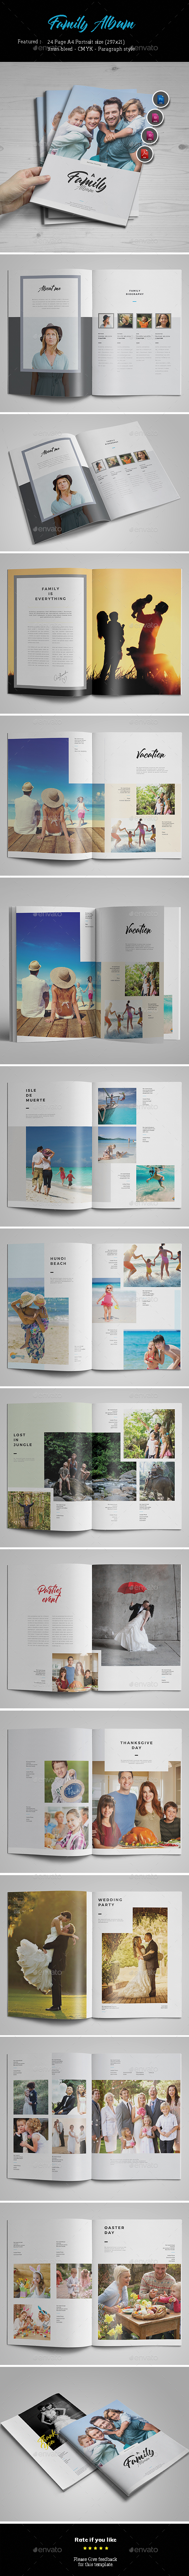 Family Album Template - Photo Albums Print Templates